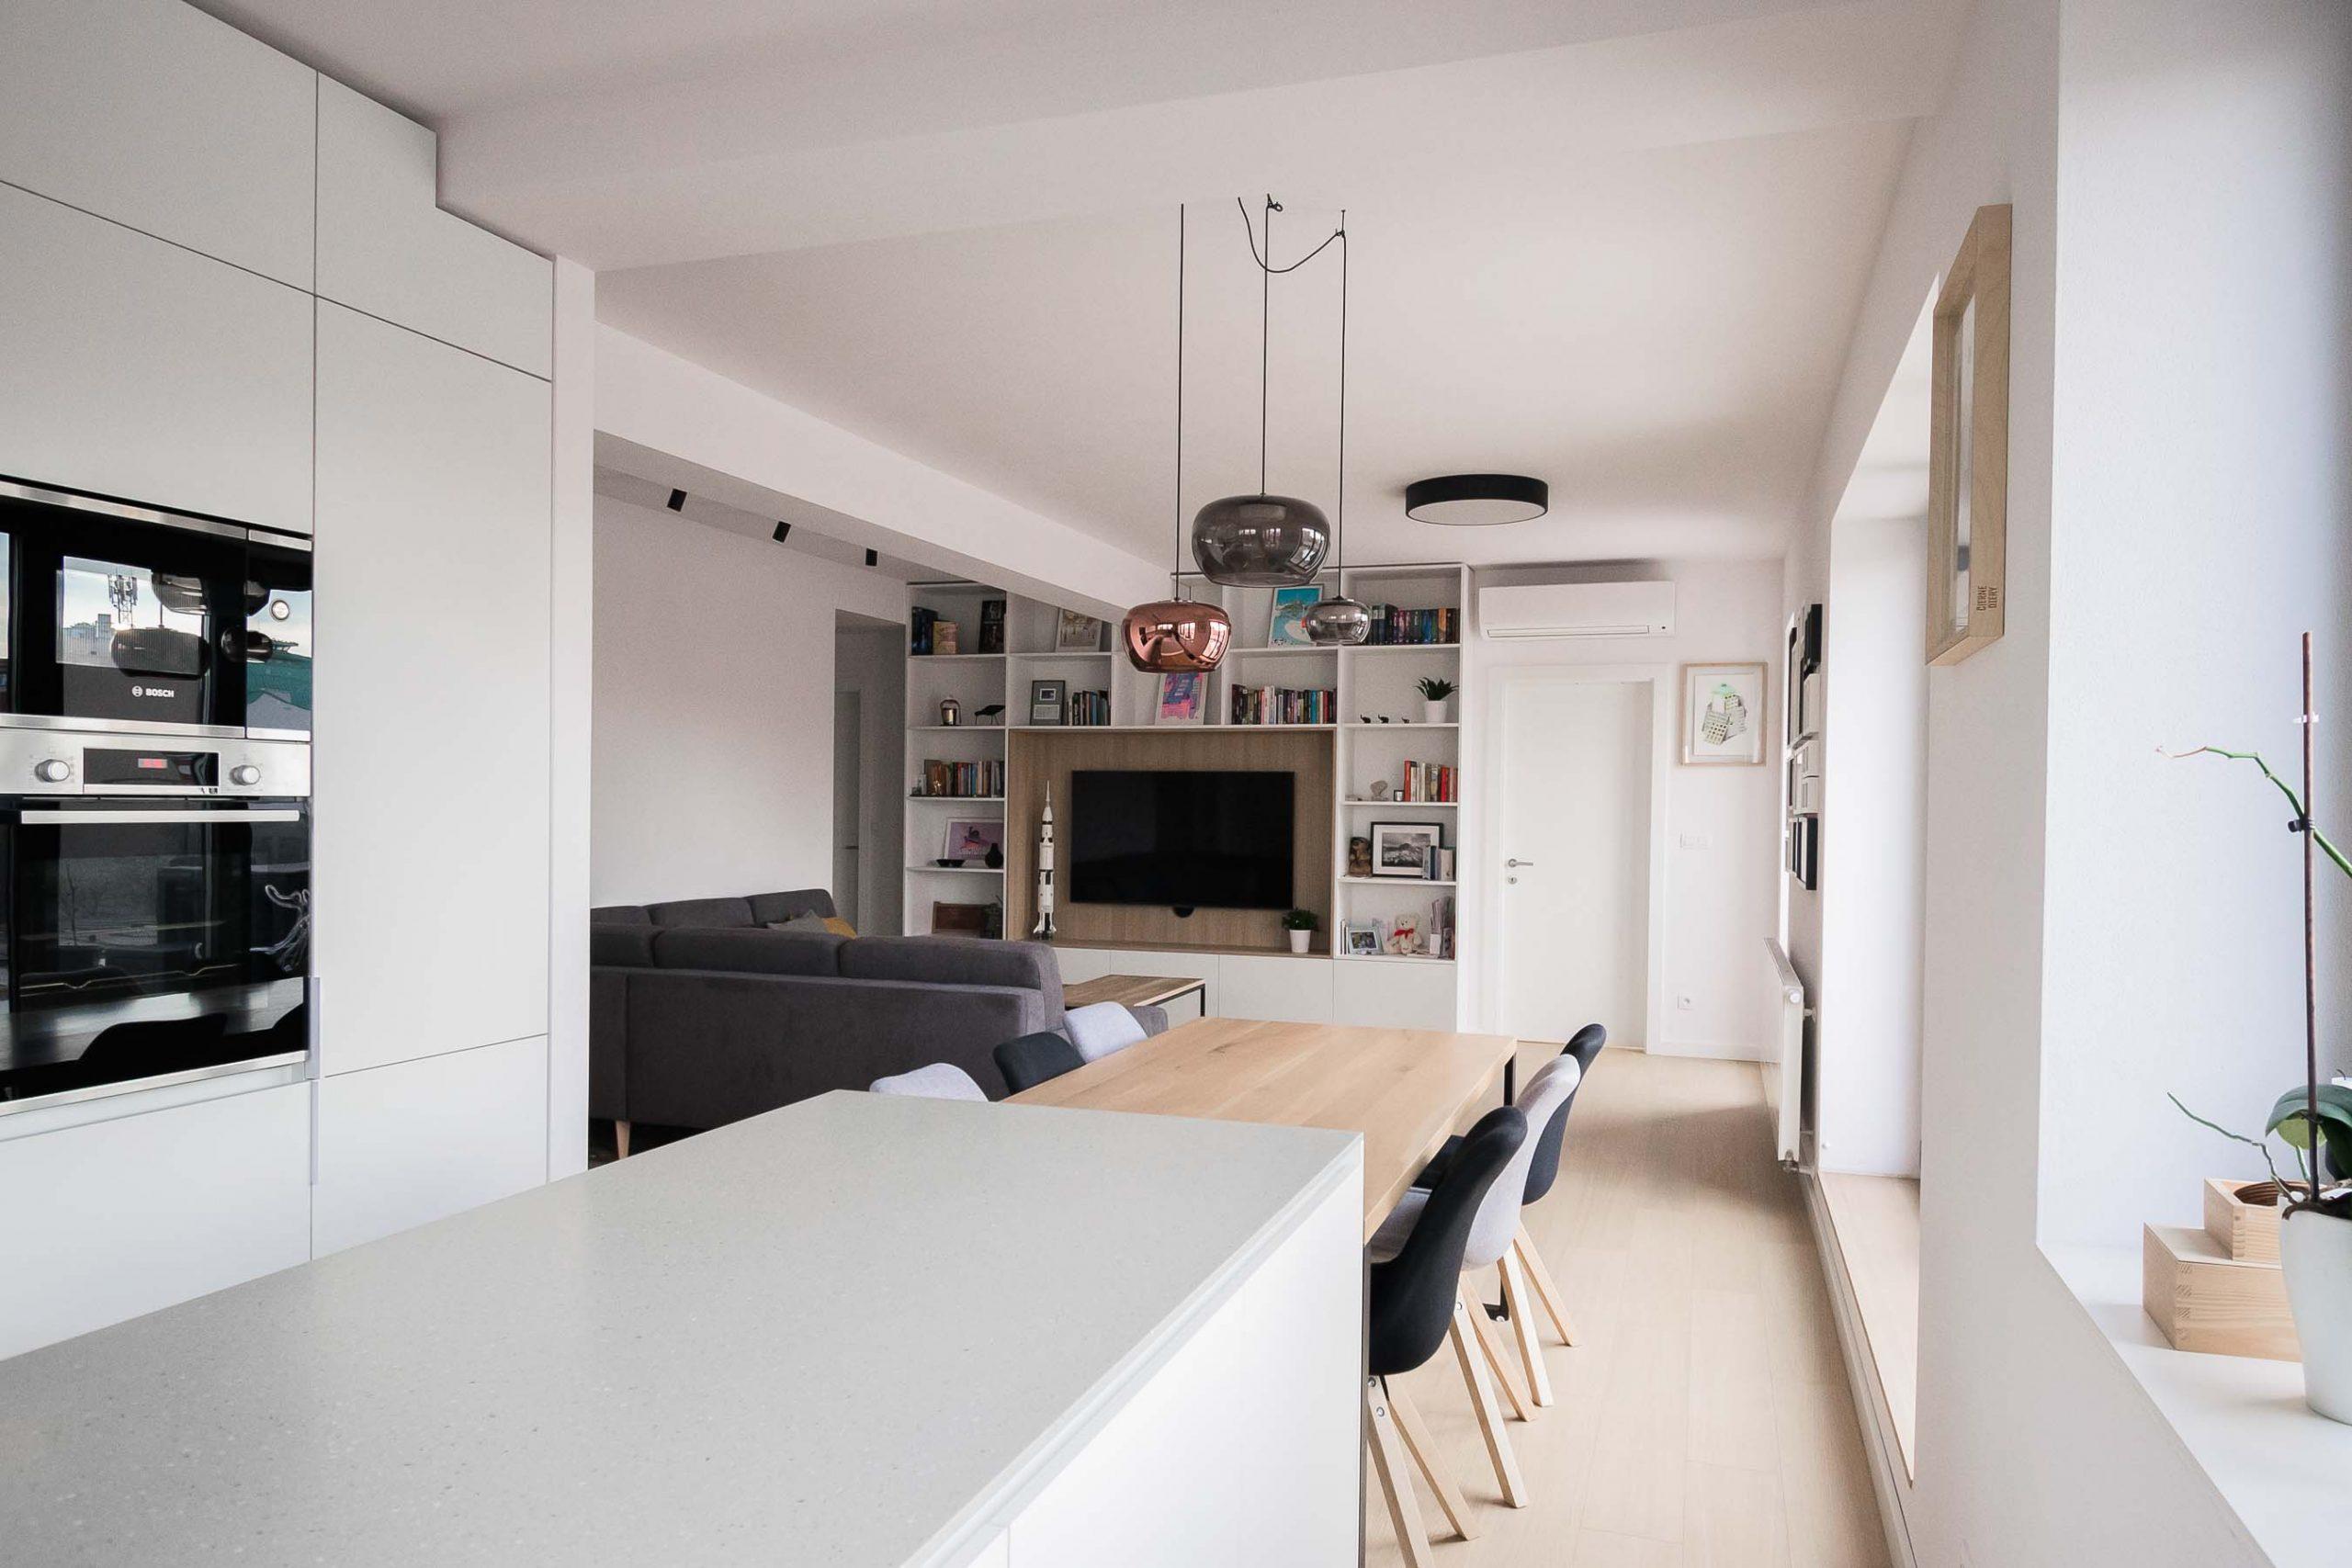 Interier terasoveho bytu, Bratislava, obyvacia izba, VAUarchitects